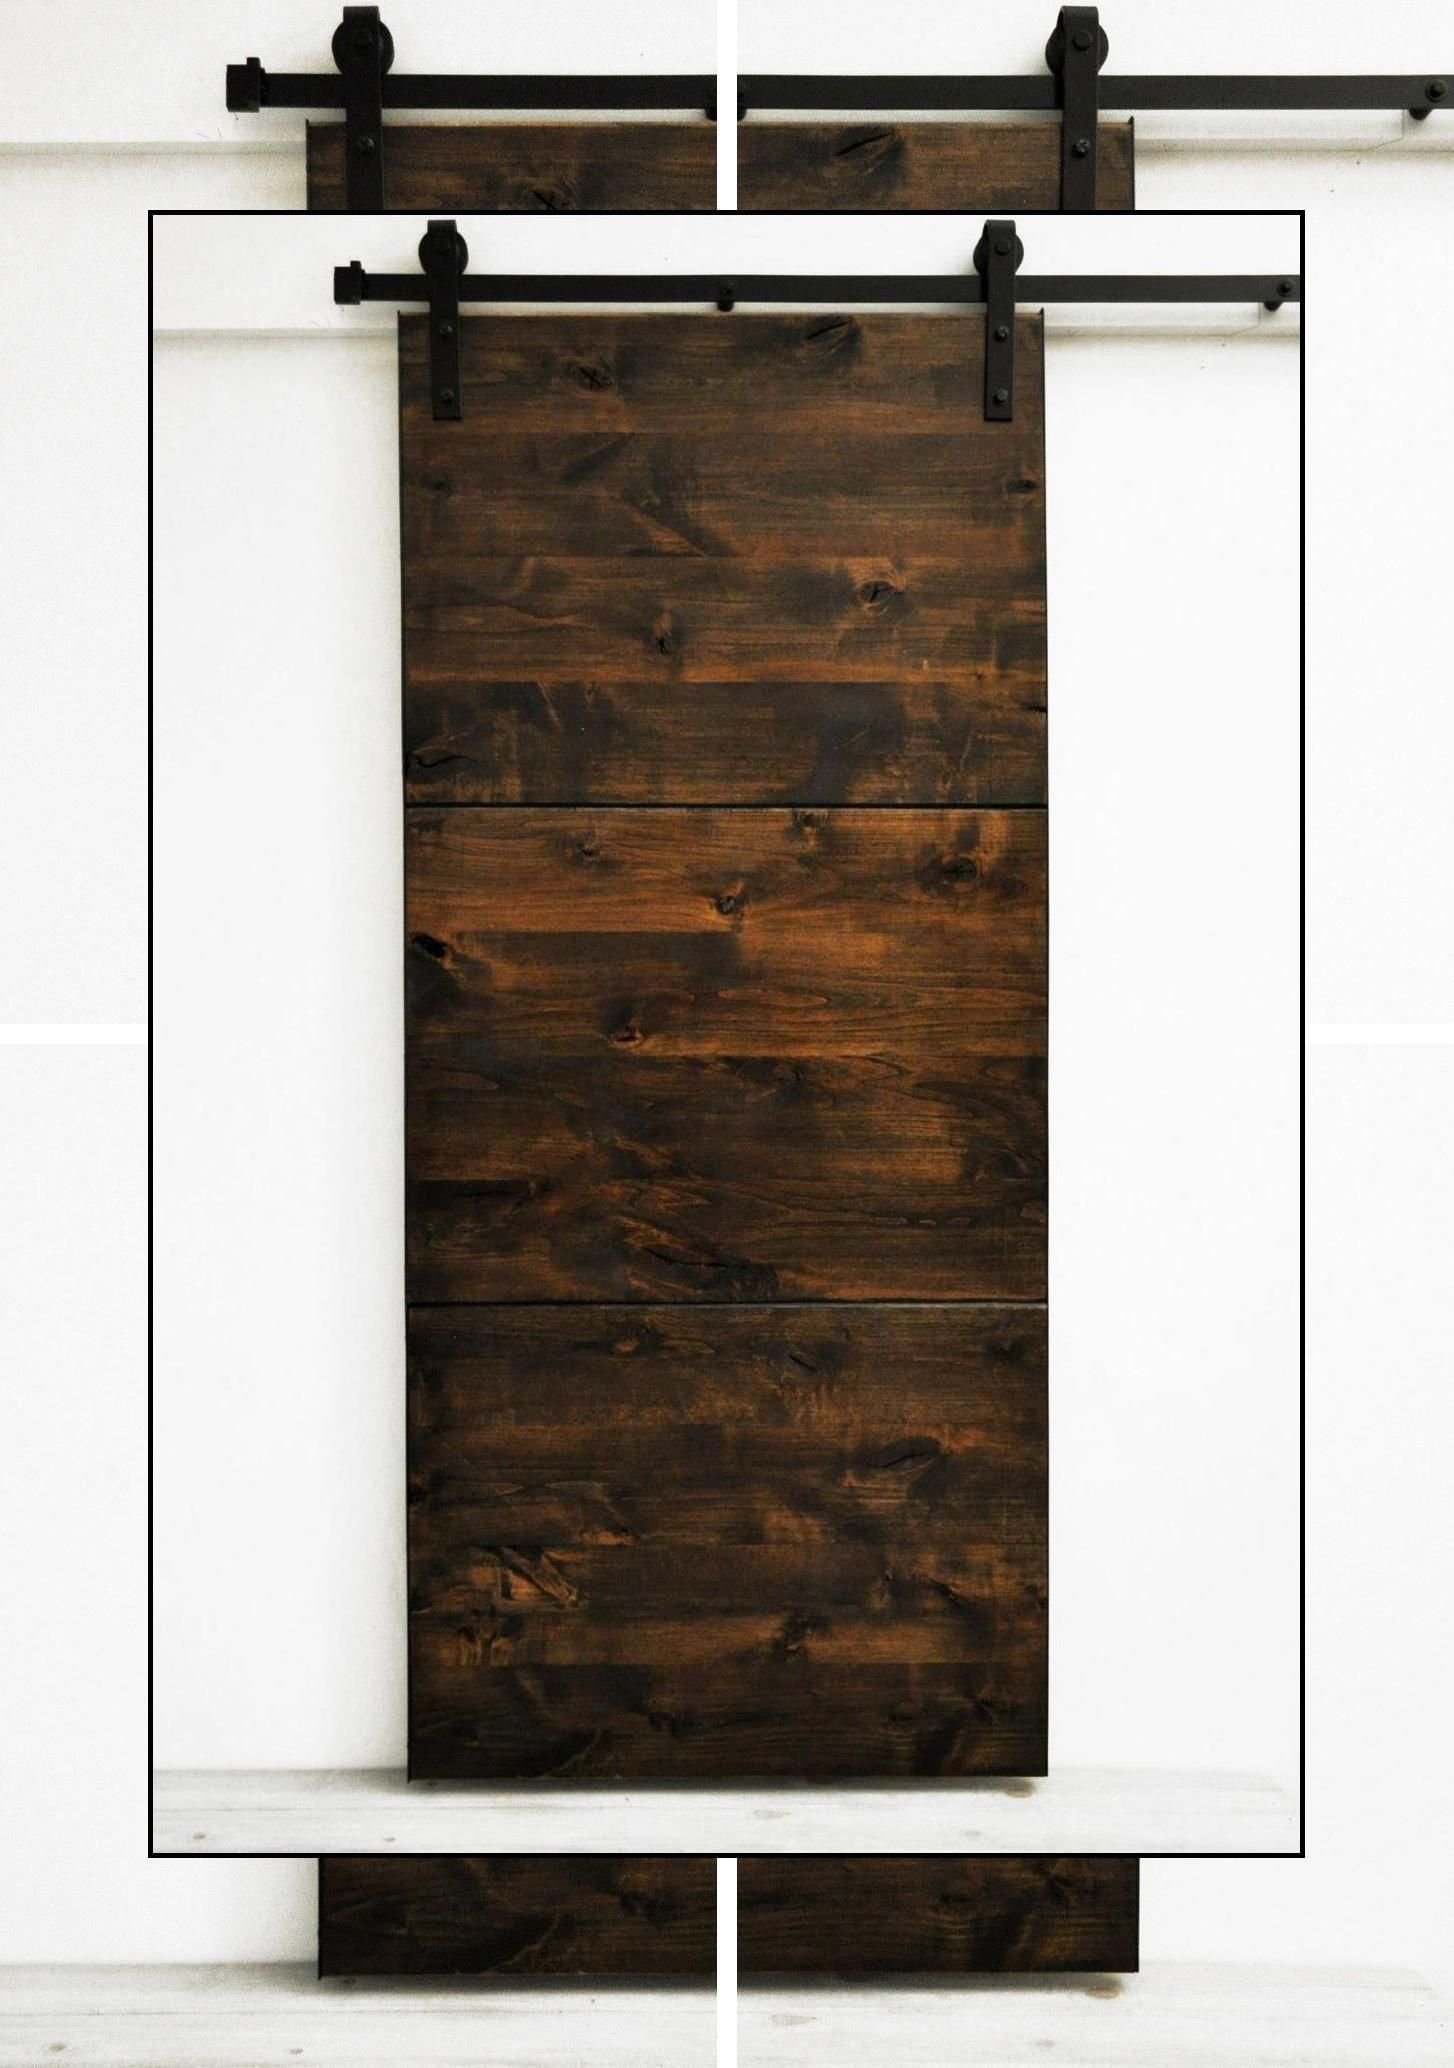 Hanging Barn Doors Interior Pole Barn Door Hardware Interior Sliding Wood Doors In 2020 Wood Doors Interior Door Design Interior Barn Doors For Sale